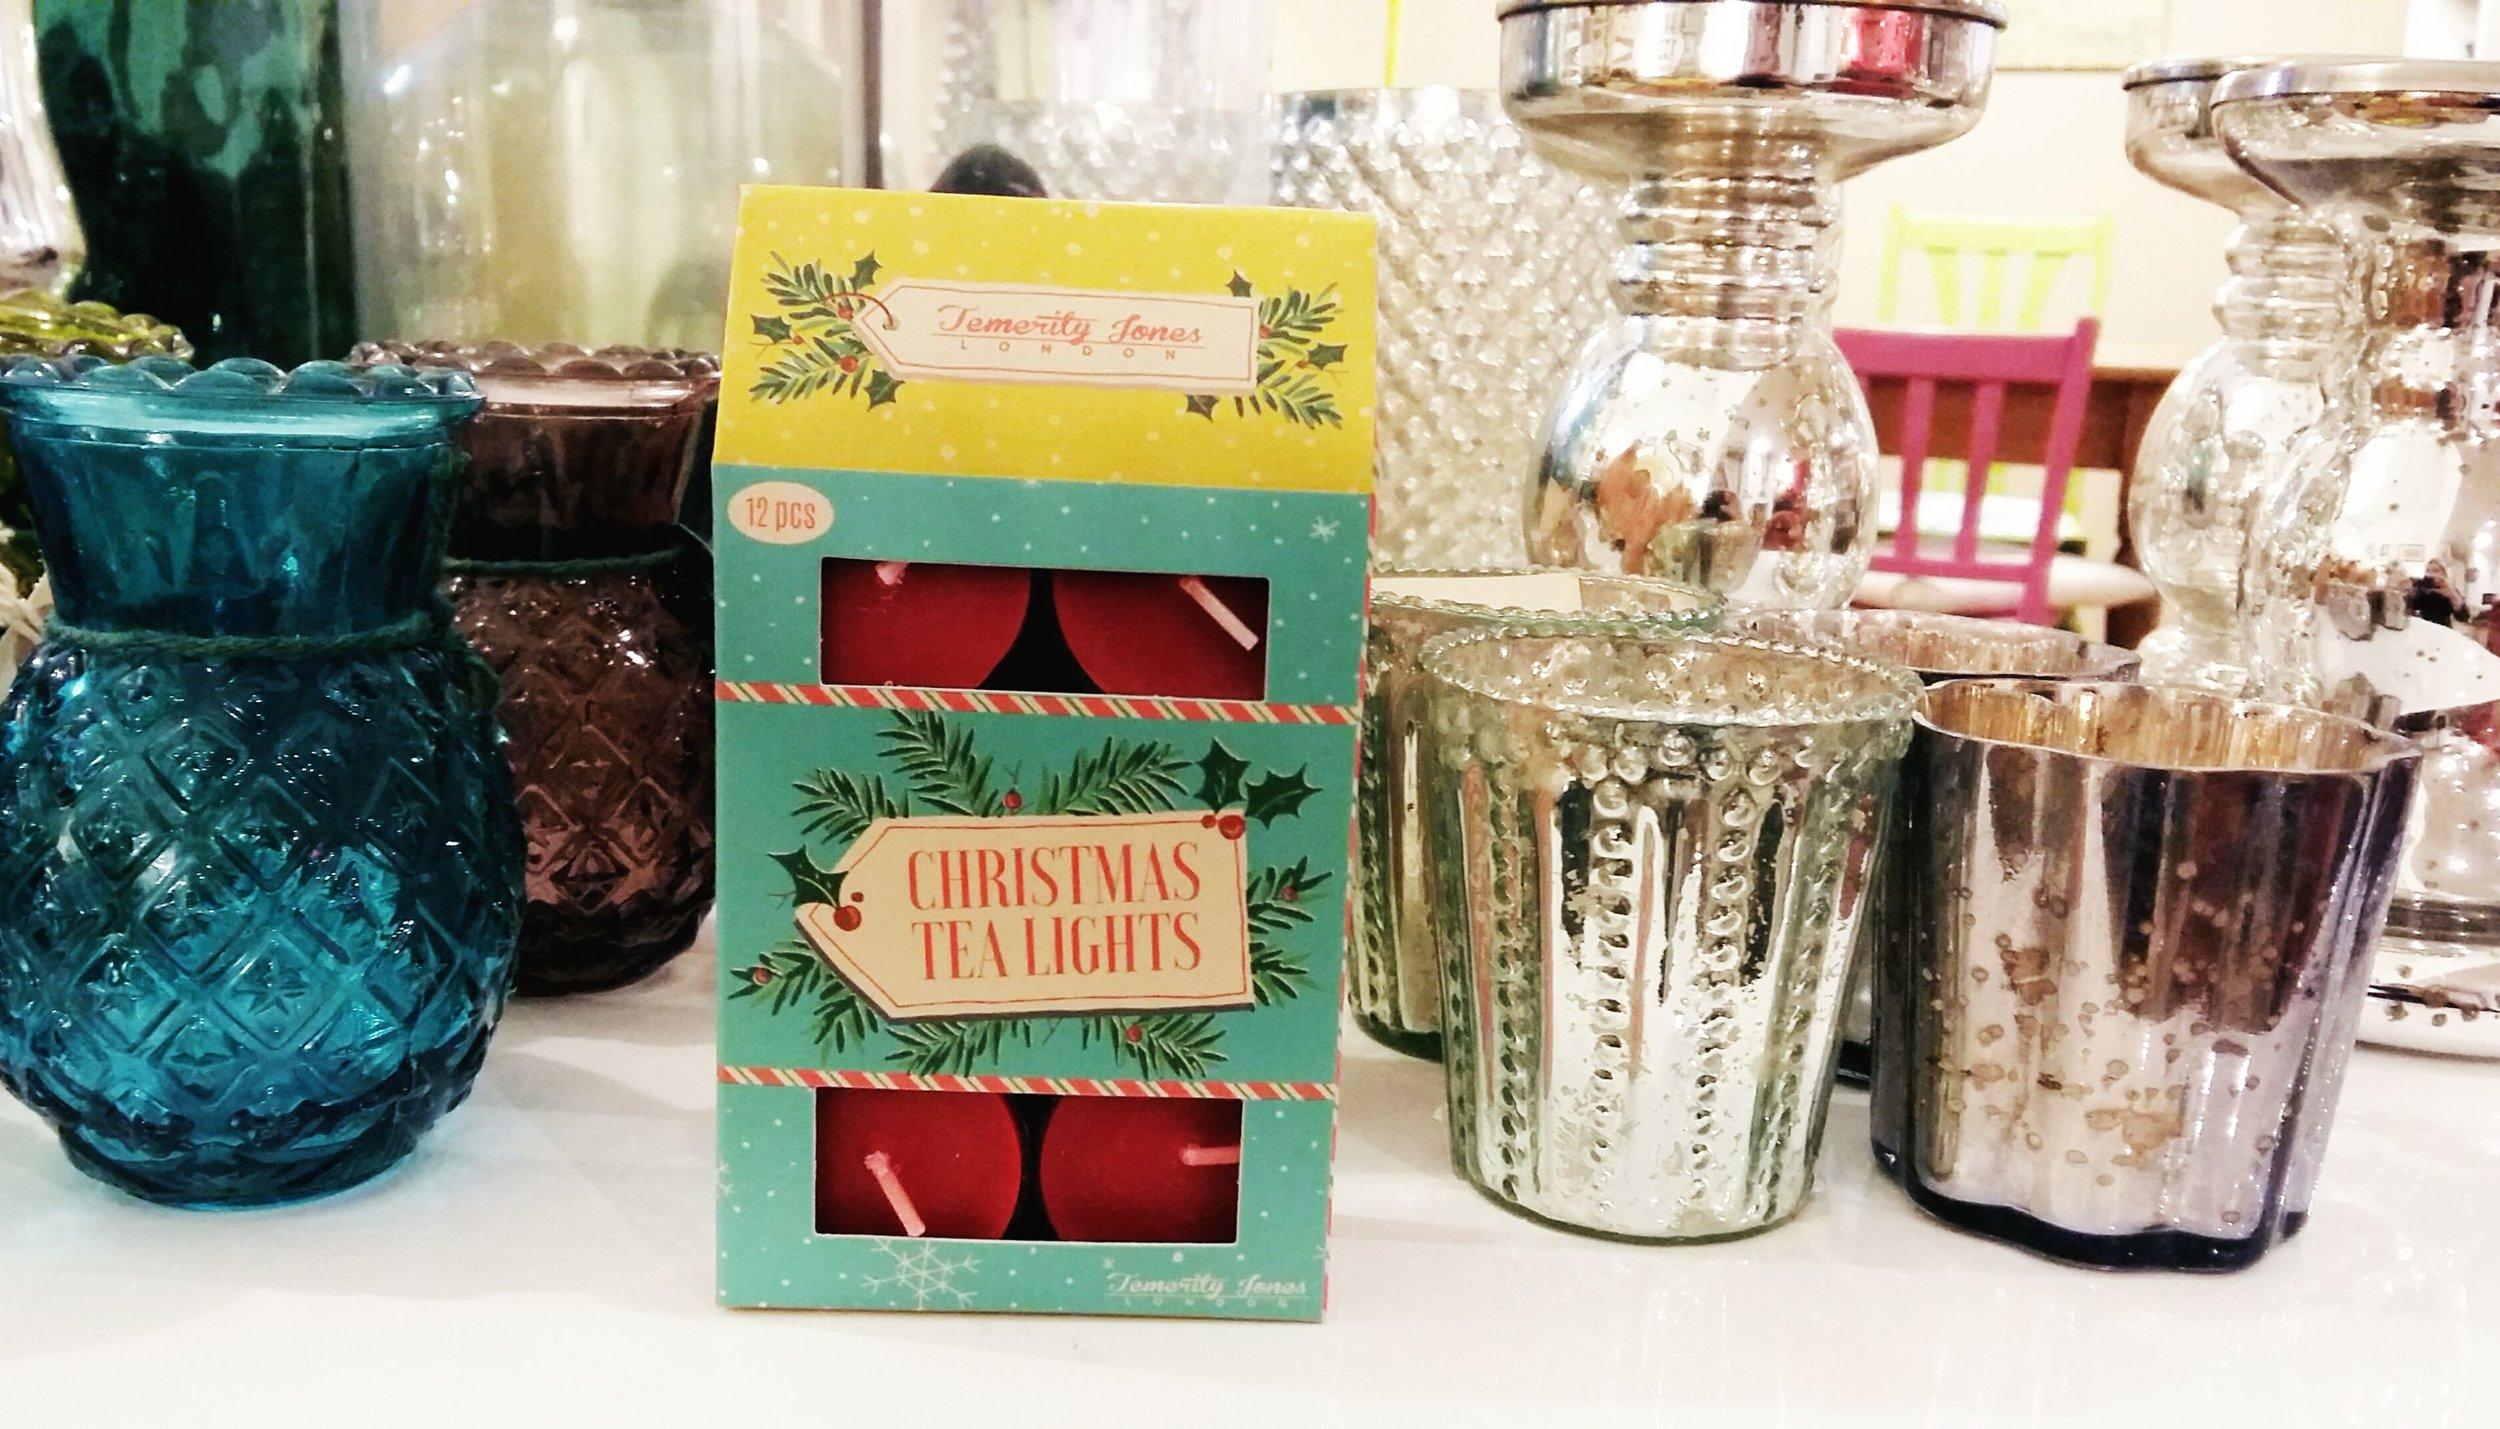 Christmas scented nightlights